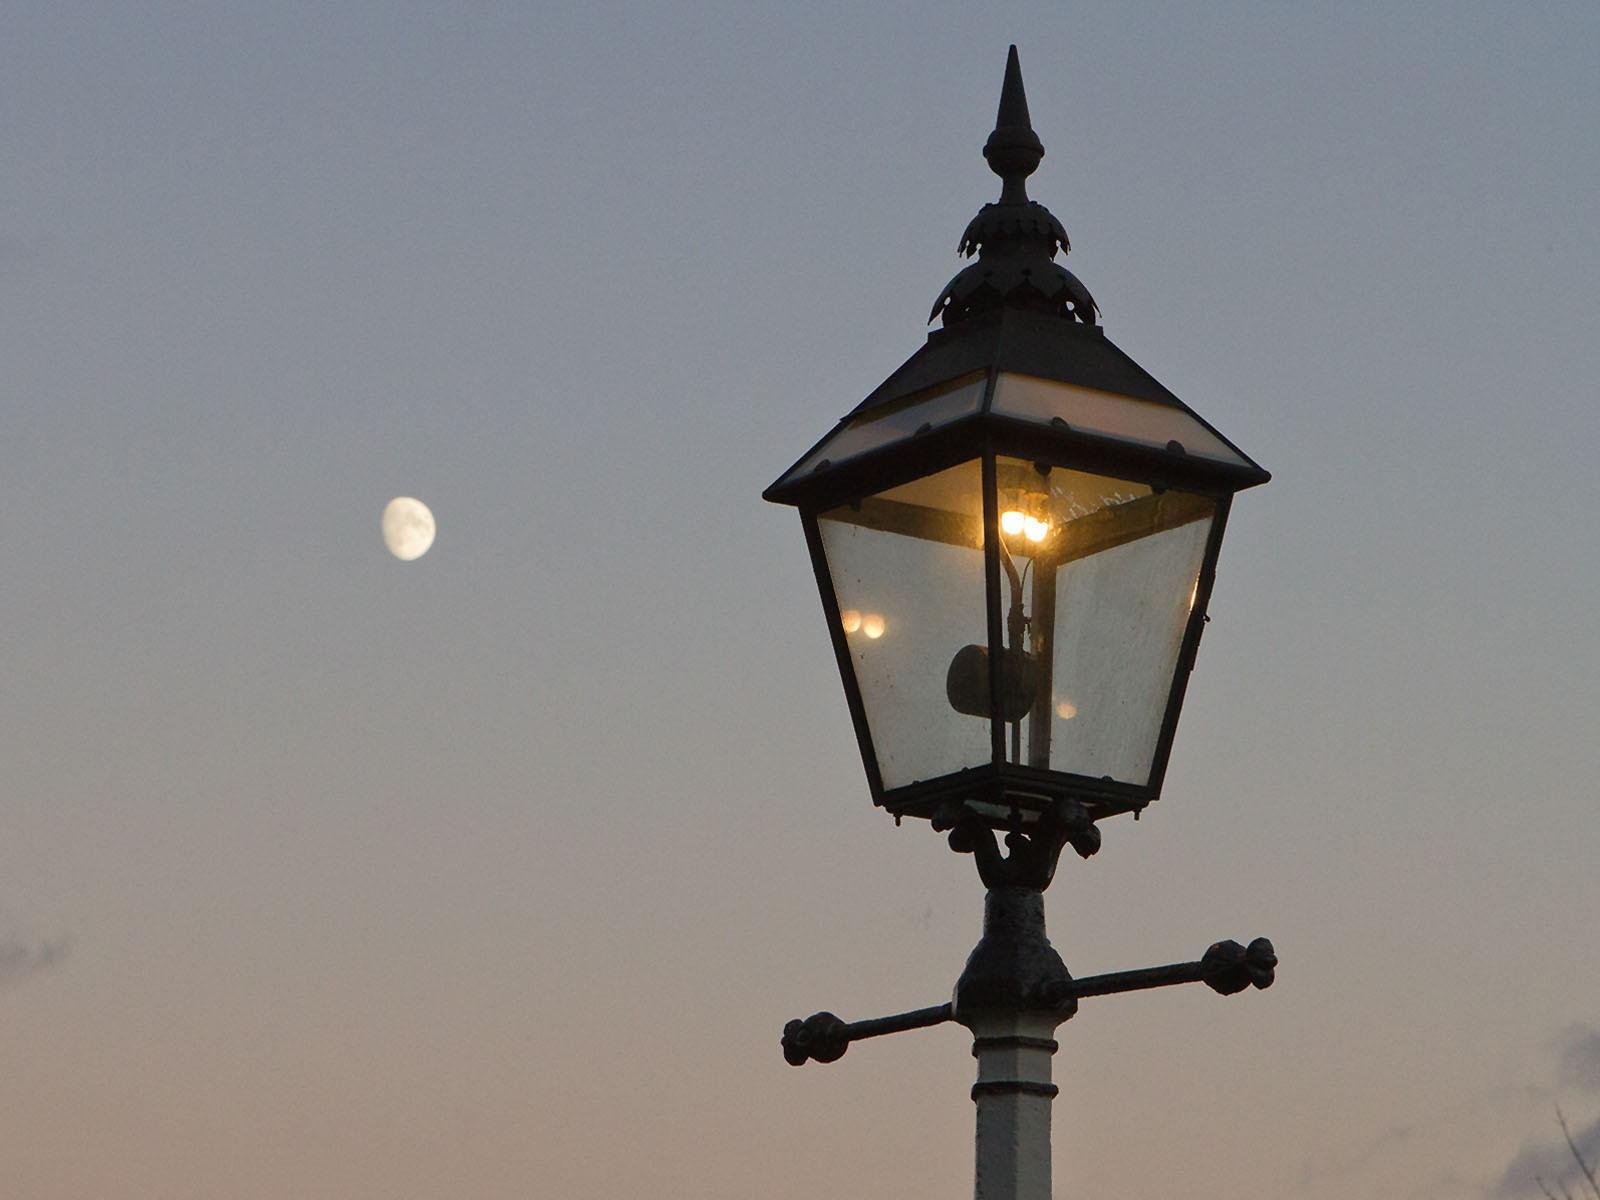 IMG_3524 kwvr gaslight and moon